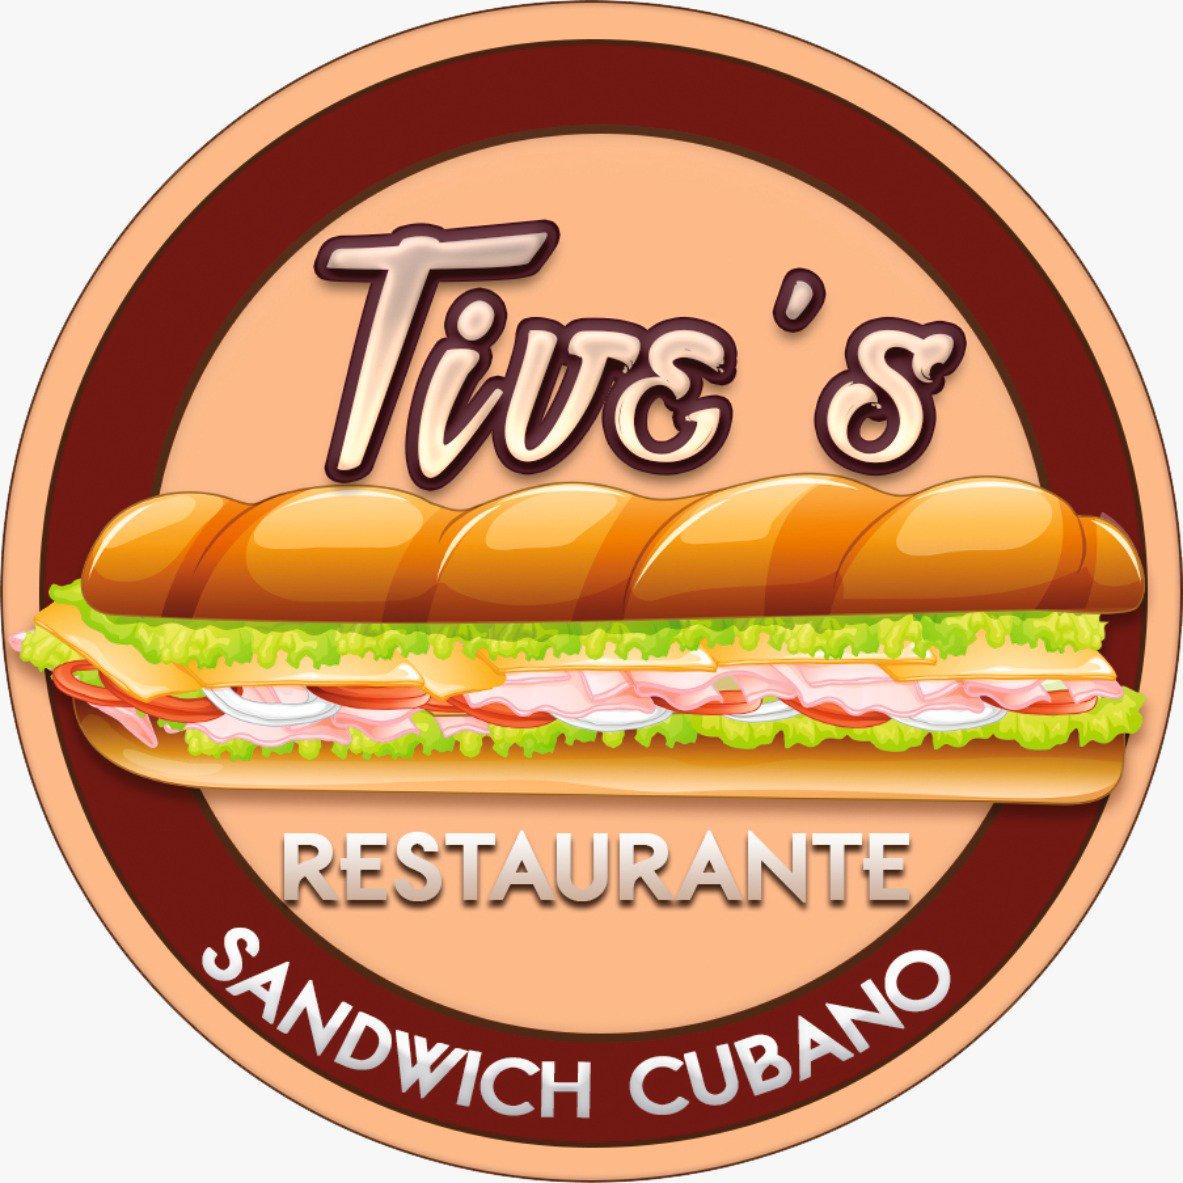 Tive's